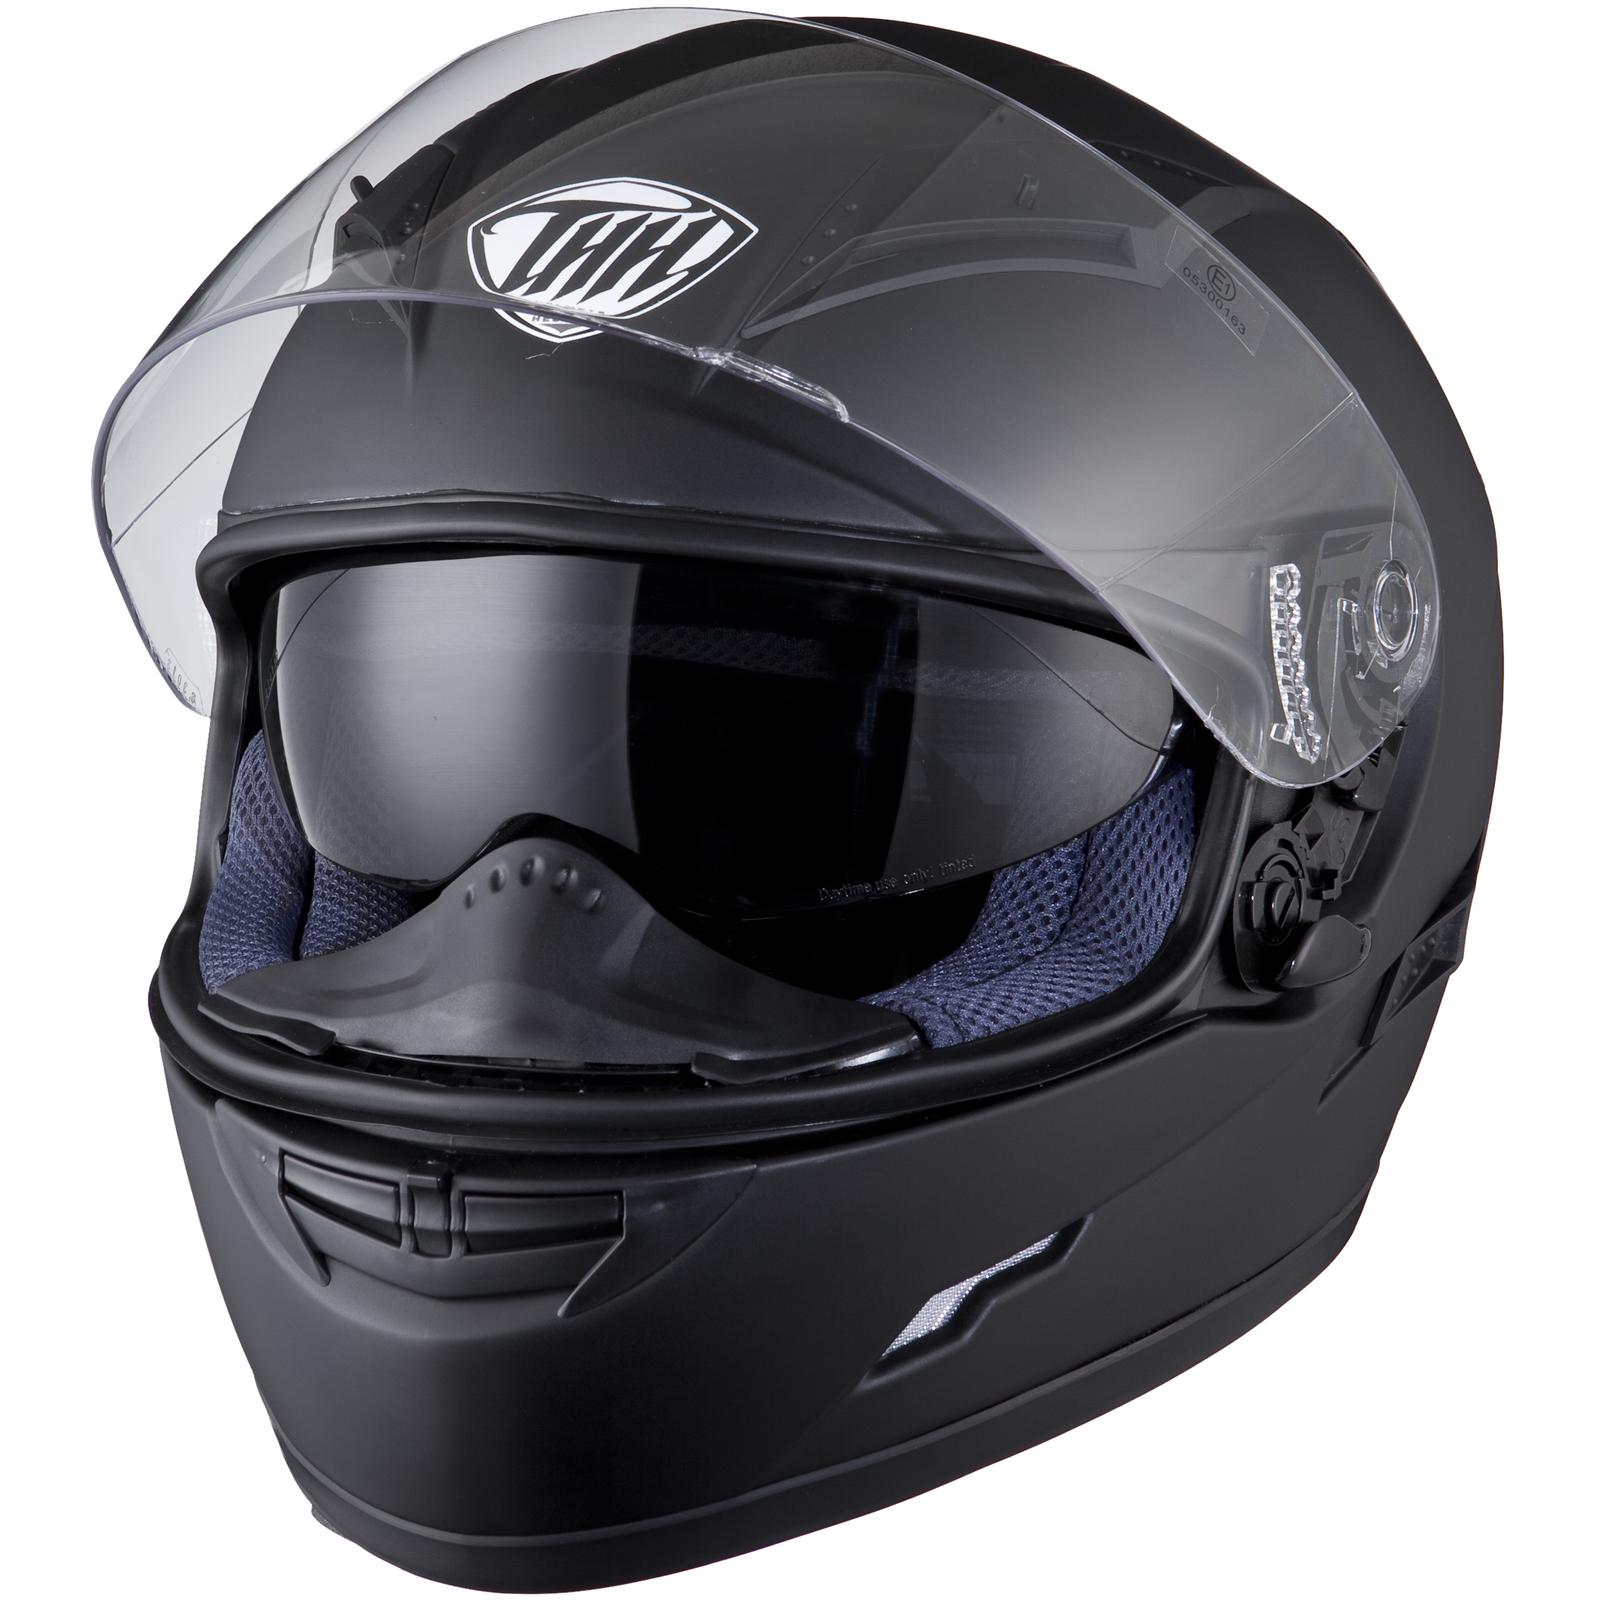 Thh Ts 80 Plain Matt Black Motorcycle Helmet Motorbike Solid Bike